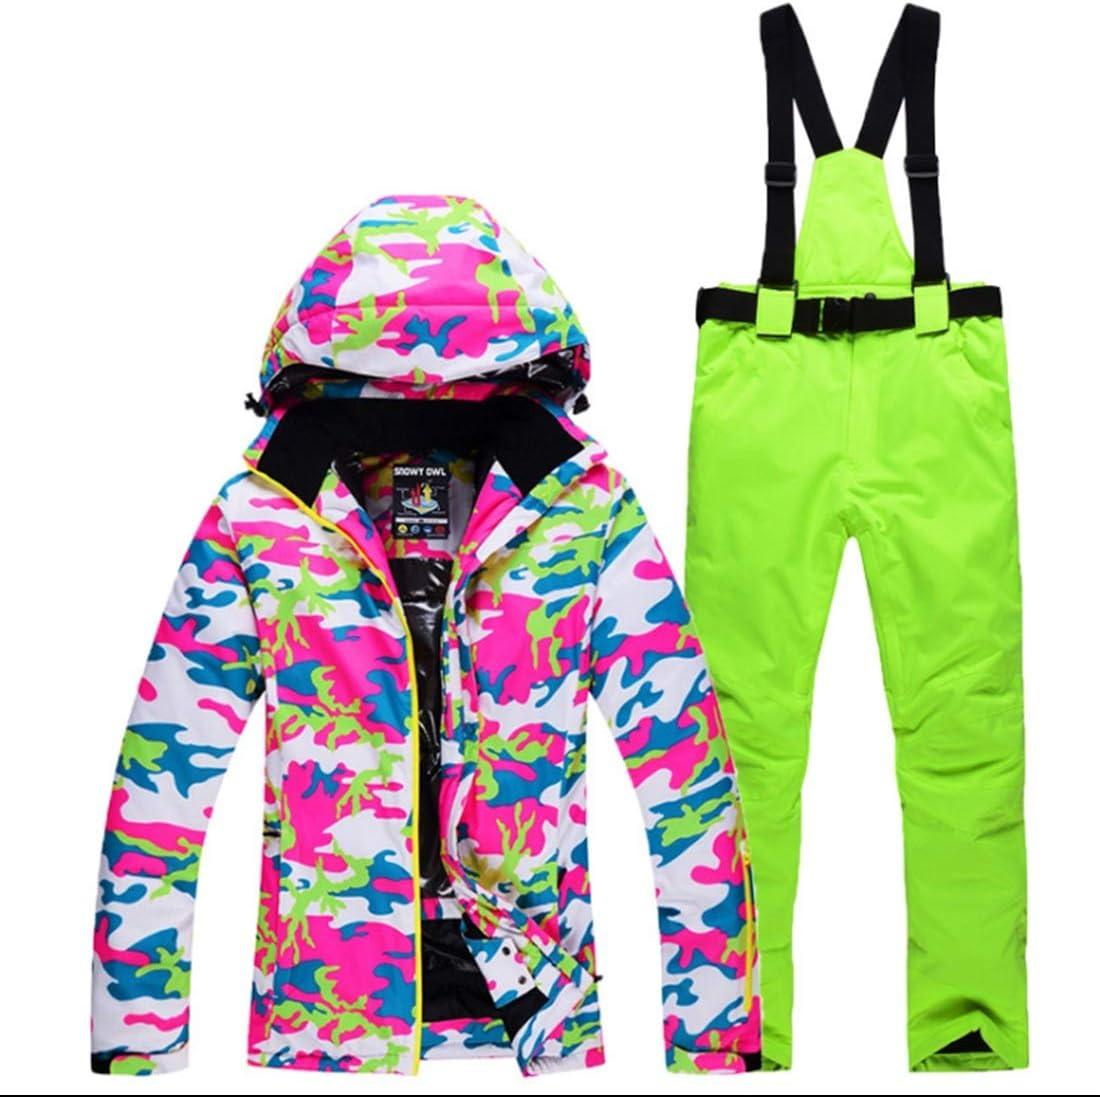 Wazenku 女性のマウンテンスキージャケット防水防風暖かい冬のレインコート (色 : 05, サイズ : S)  Small